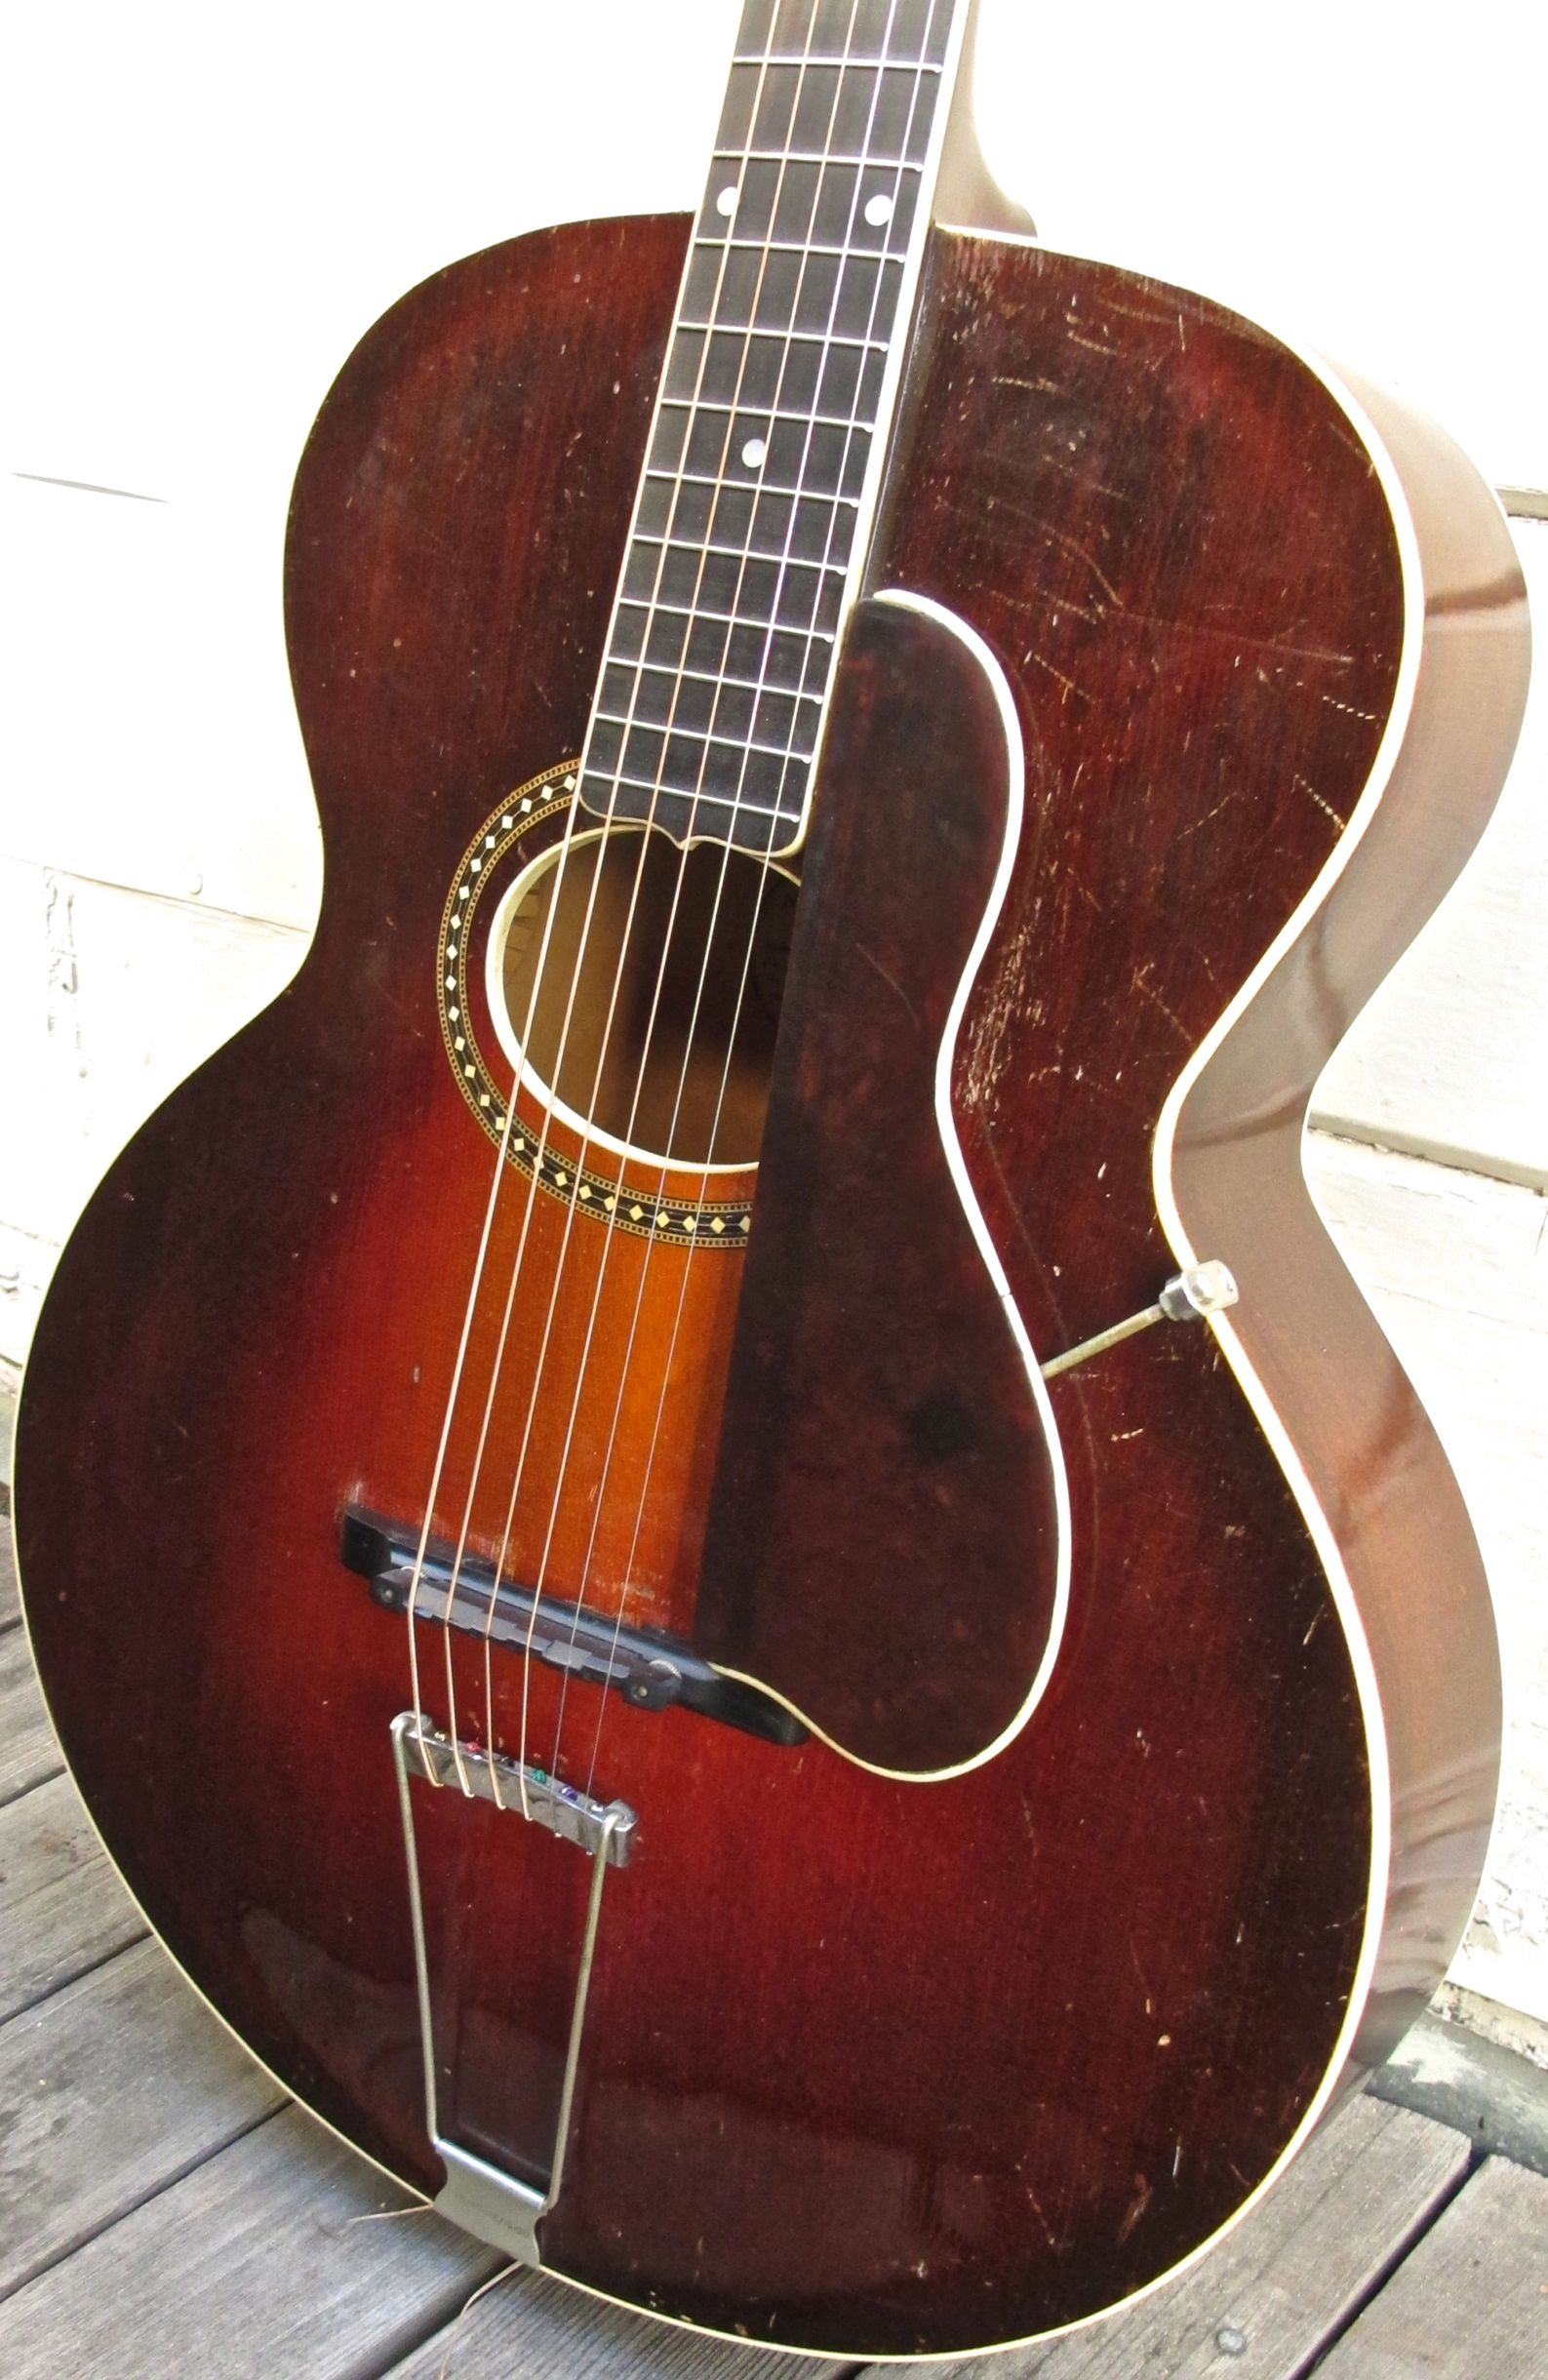 Gibson L4 Archtop Acoustic Guitar Vintage 1926  om28com